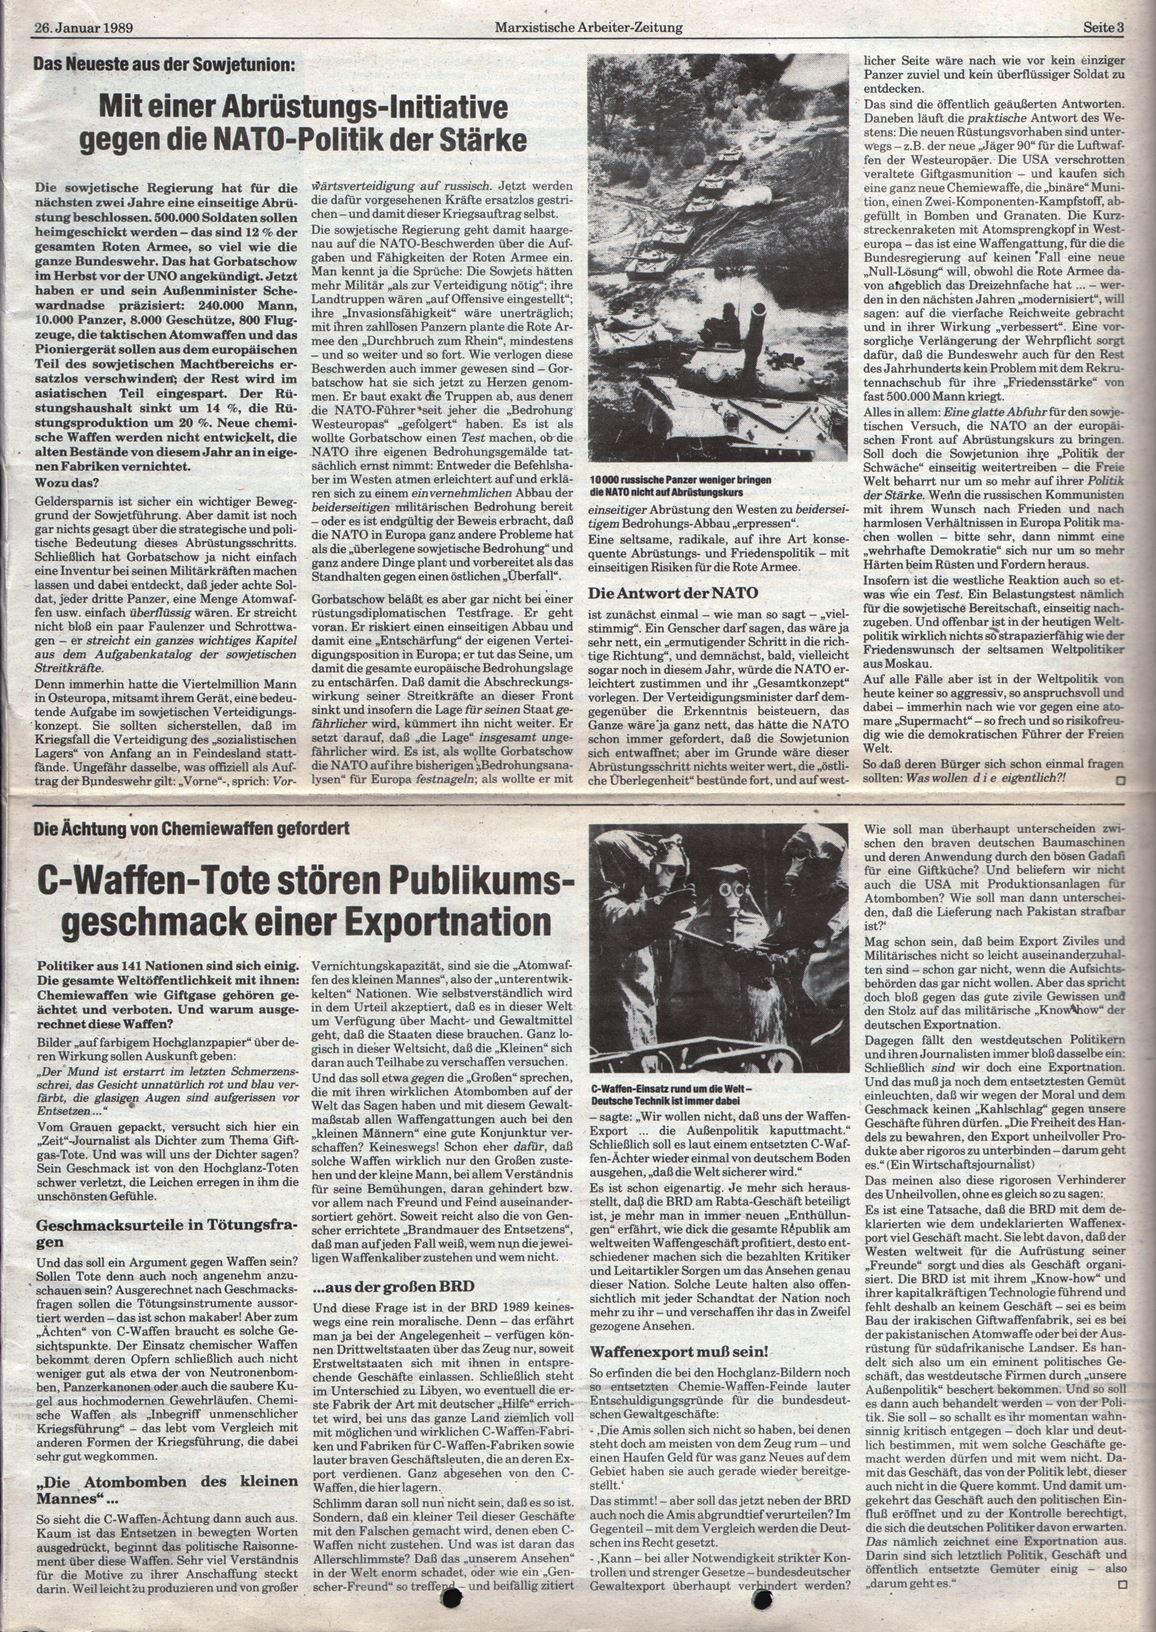 Muenchen_MG_MAZ_19890126_03